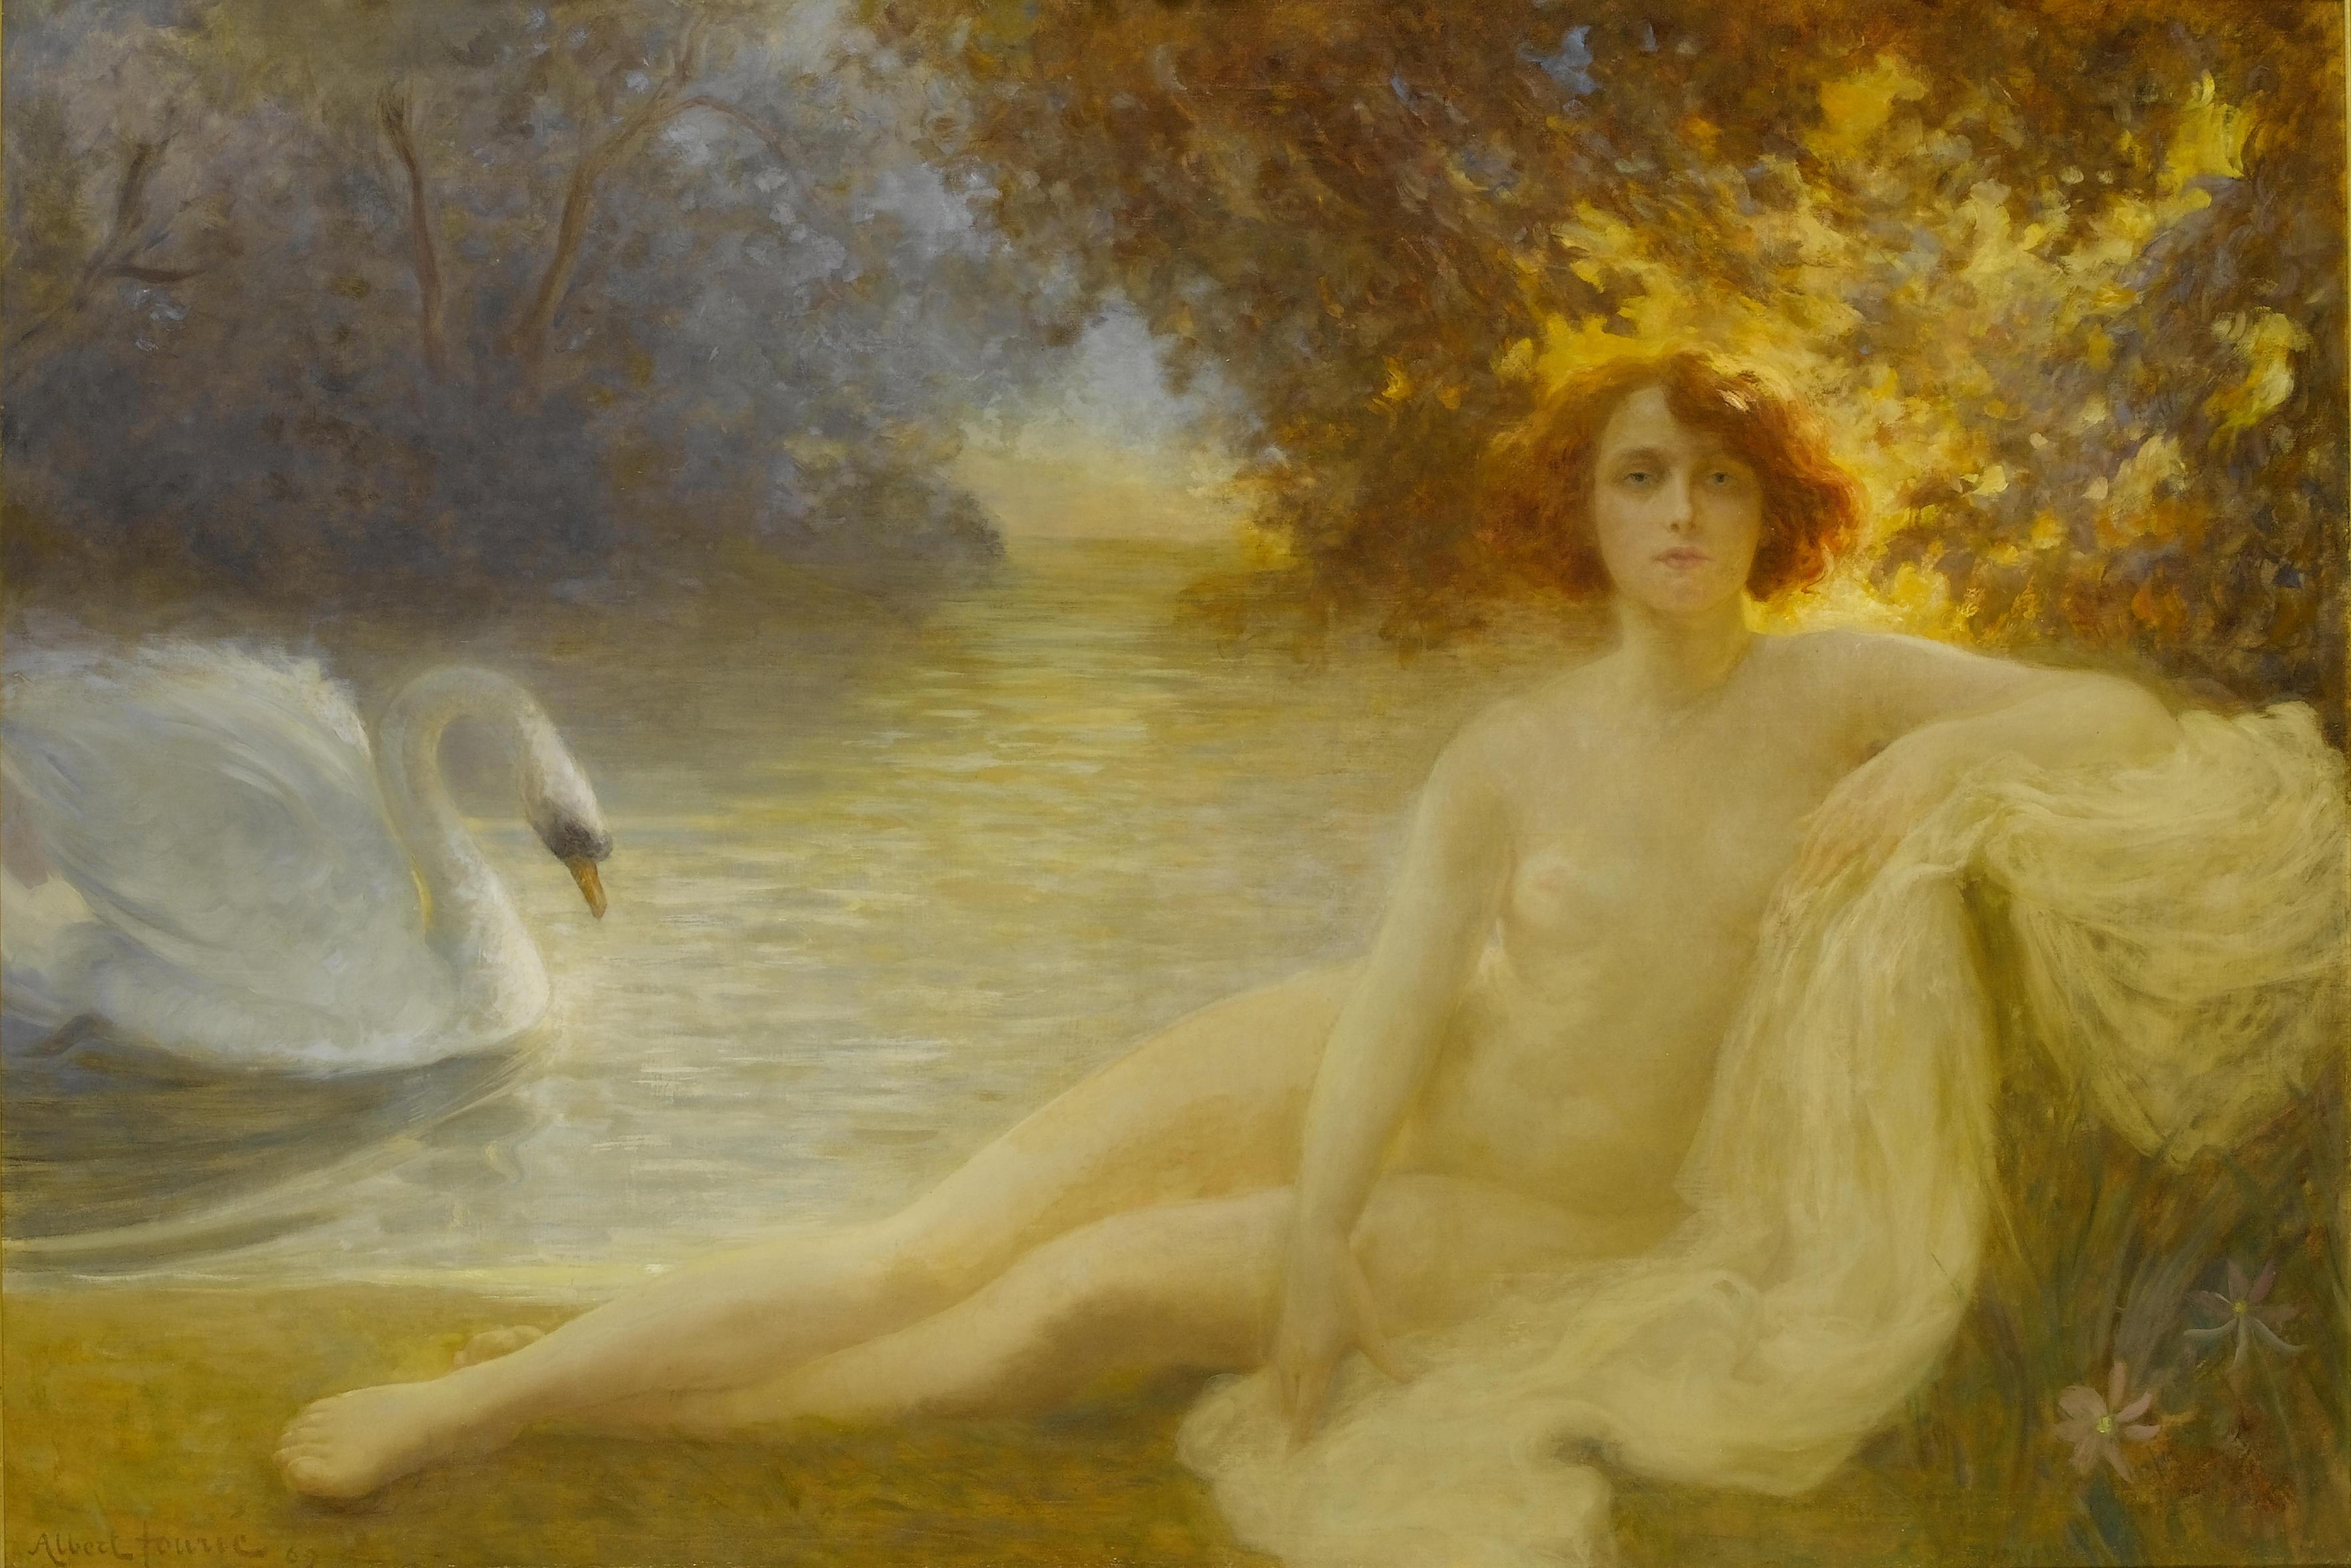 Albert Auguste Fourie, 1854-1896. Леда и лебедь. 1890. 120 х 177 см. Частная коллекция